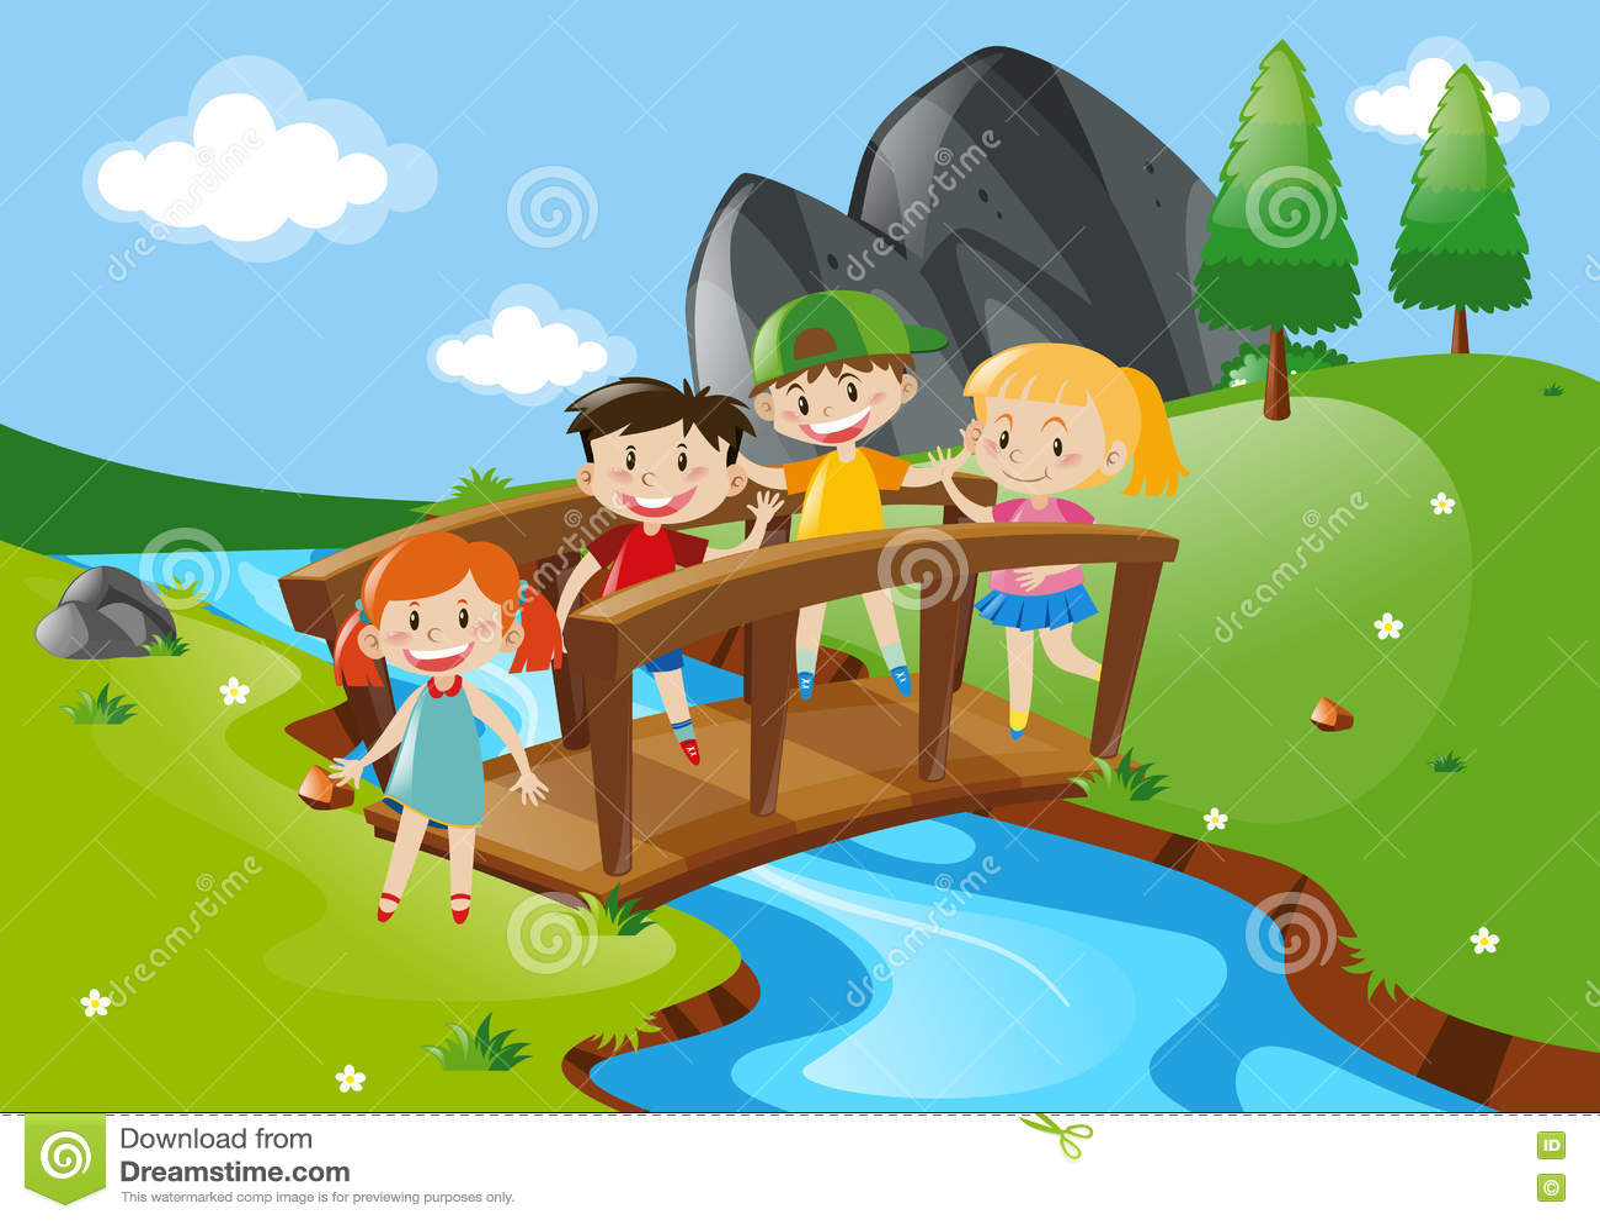 hight resolution of crossing bridge stock illustrations 3 614 crossing bridge stock illustrations vectors clipart dreamstime